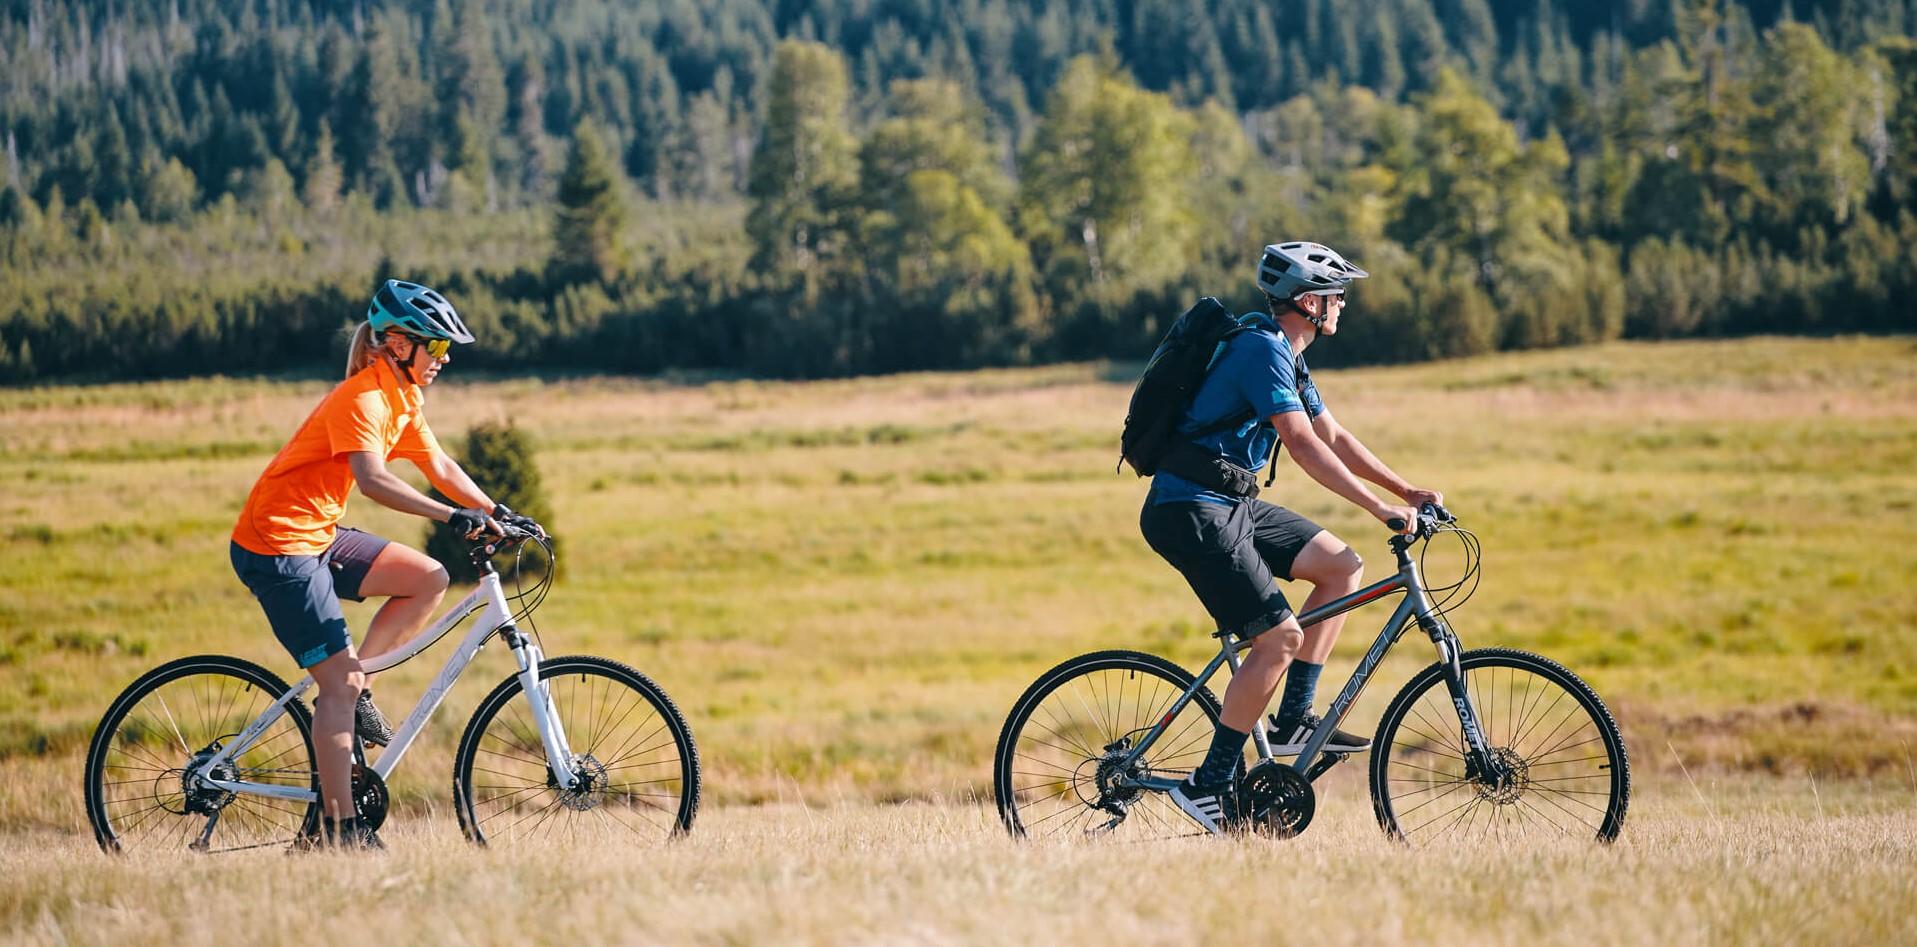 rowery crossowe marki romet